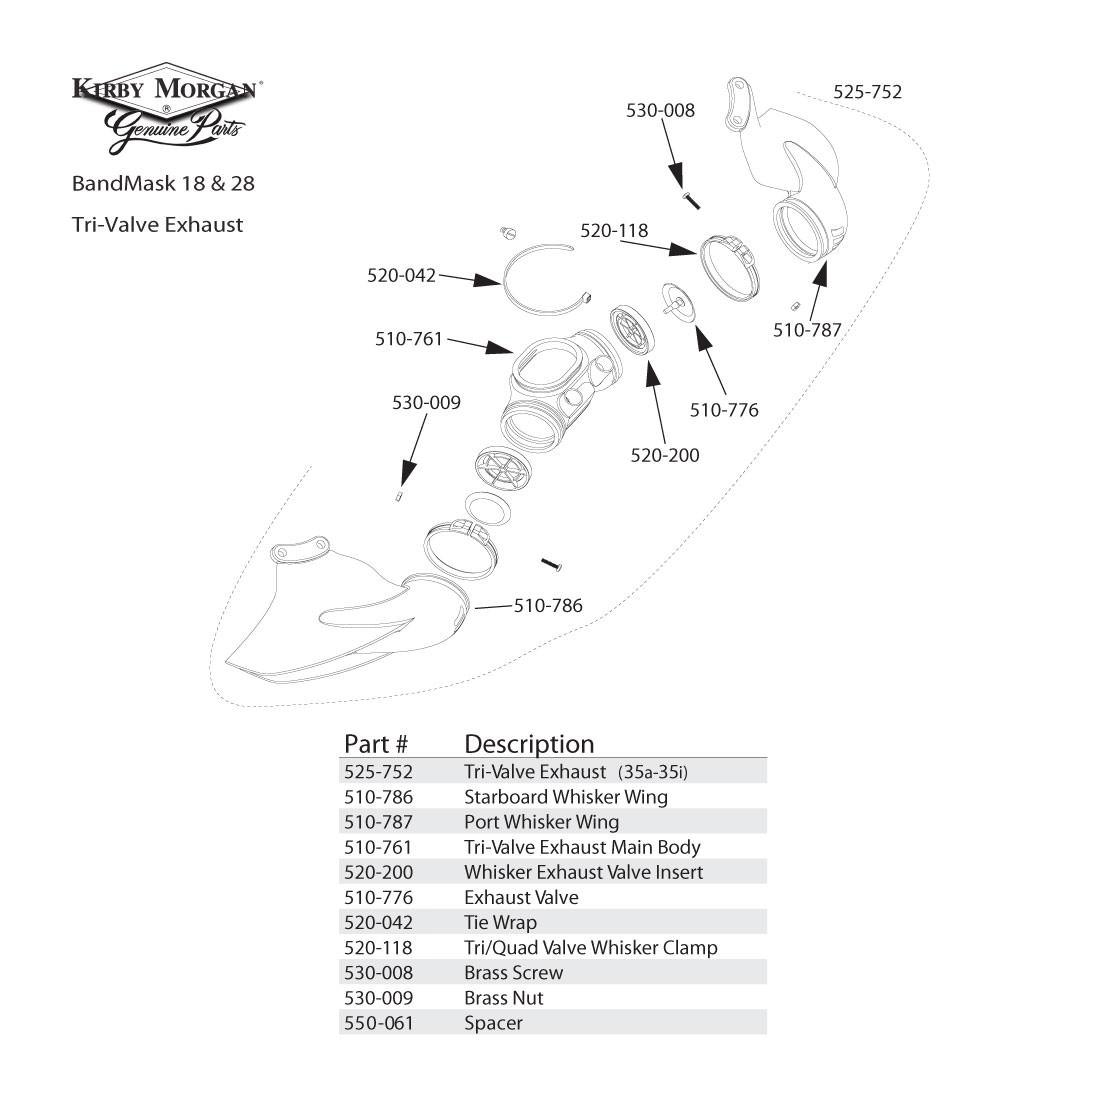 Kirby Morgan BandMask 18 - Tri-Valve Exhaust Breakout